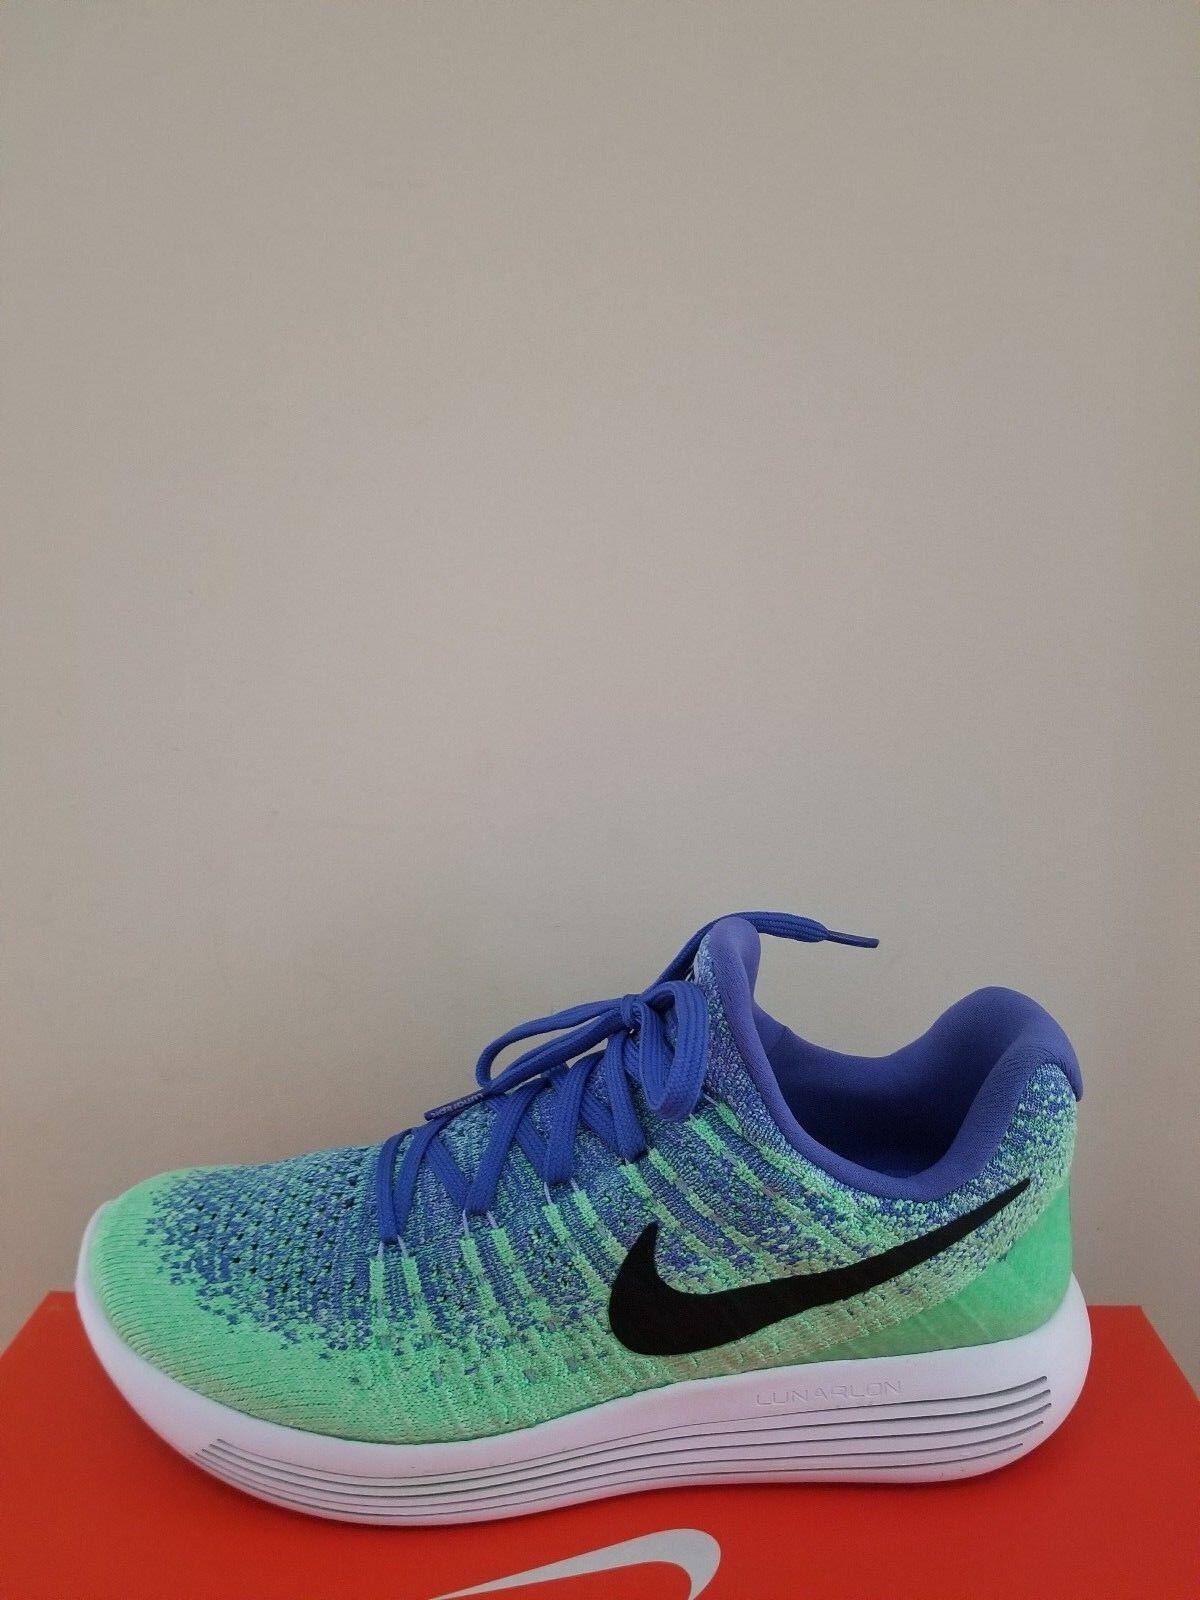 Nike Damen Lunarepic Niedrig Flyknit 2 Laufschuhe Größe 6.5 Nib